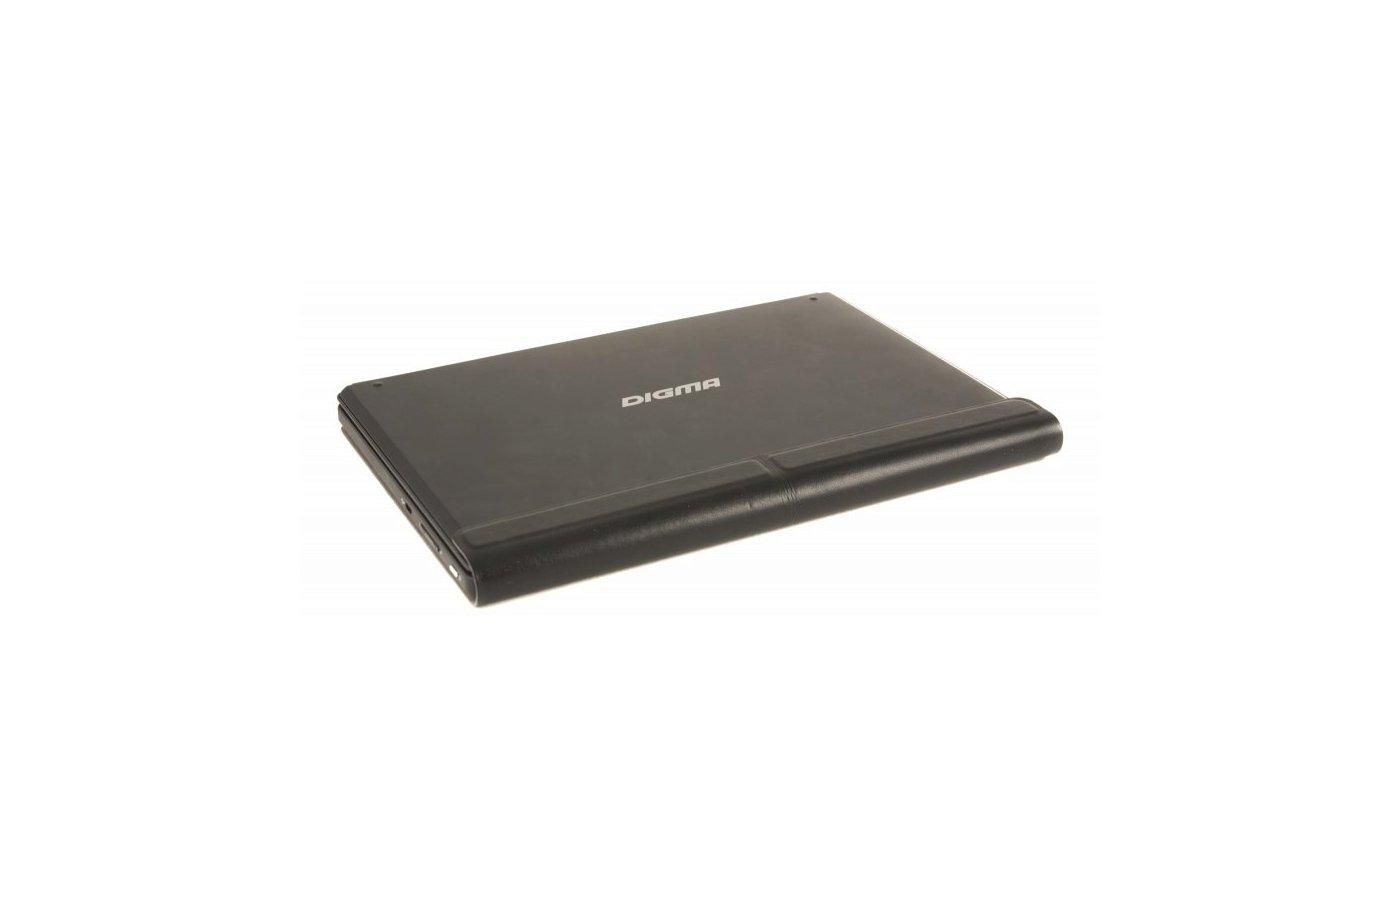 Чехол для планшетного ПК Digma Eve 10.3 3G EVE 10.3 touchpad кожа/металл/пластик черный